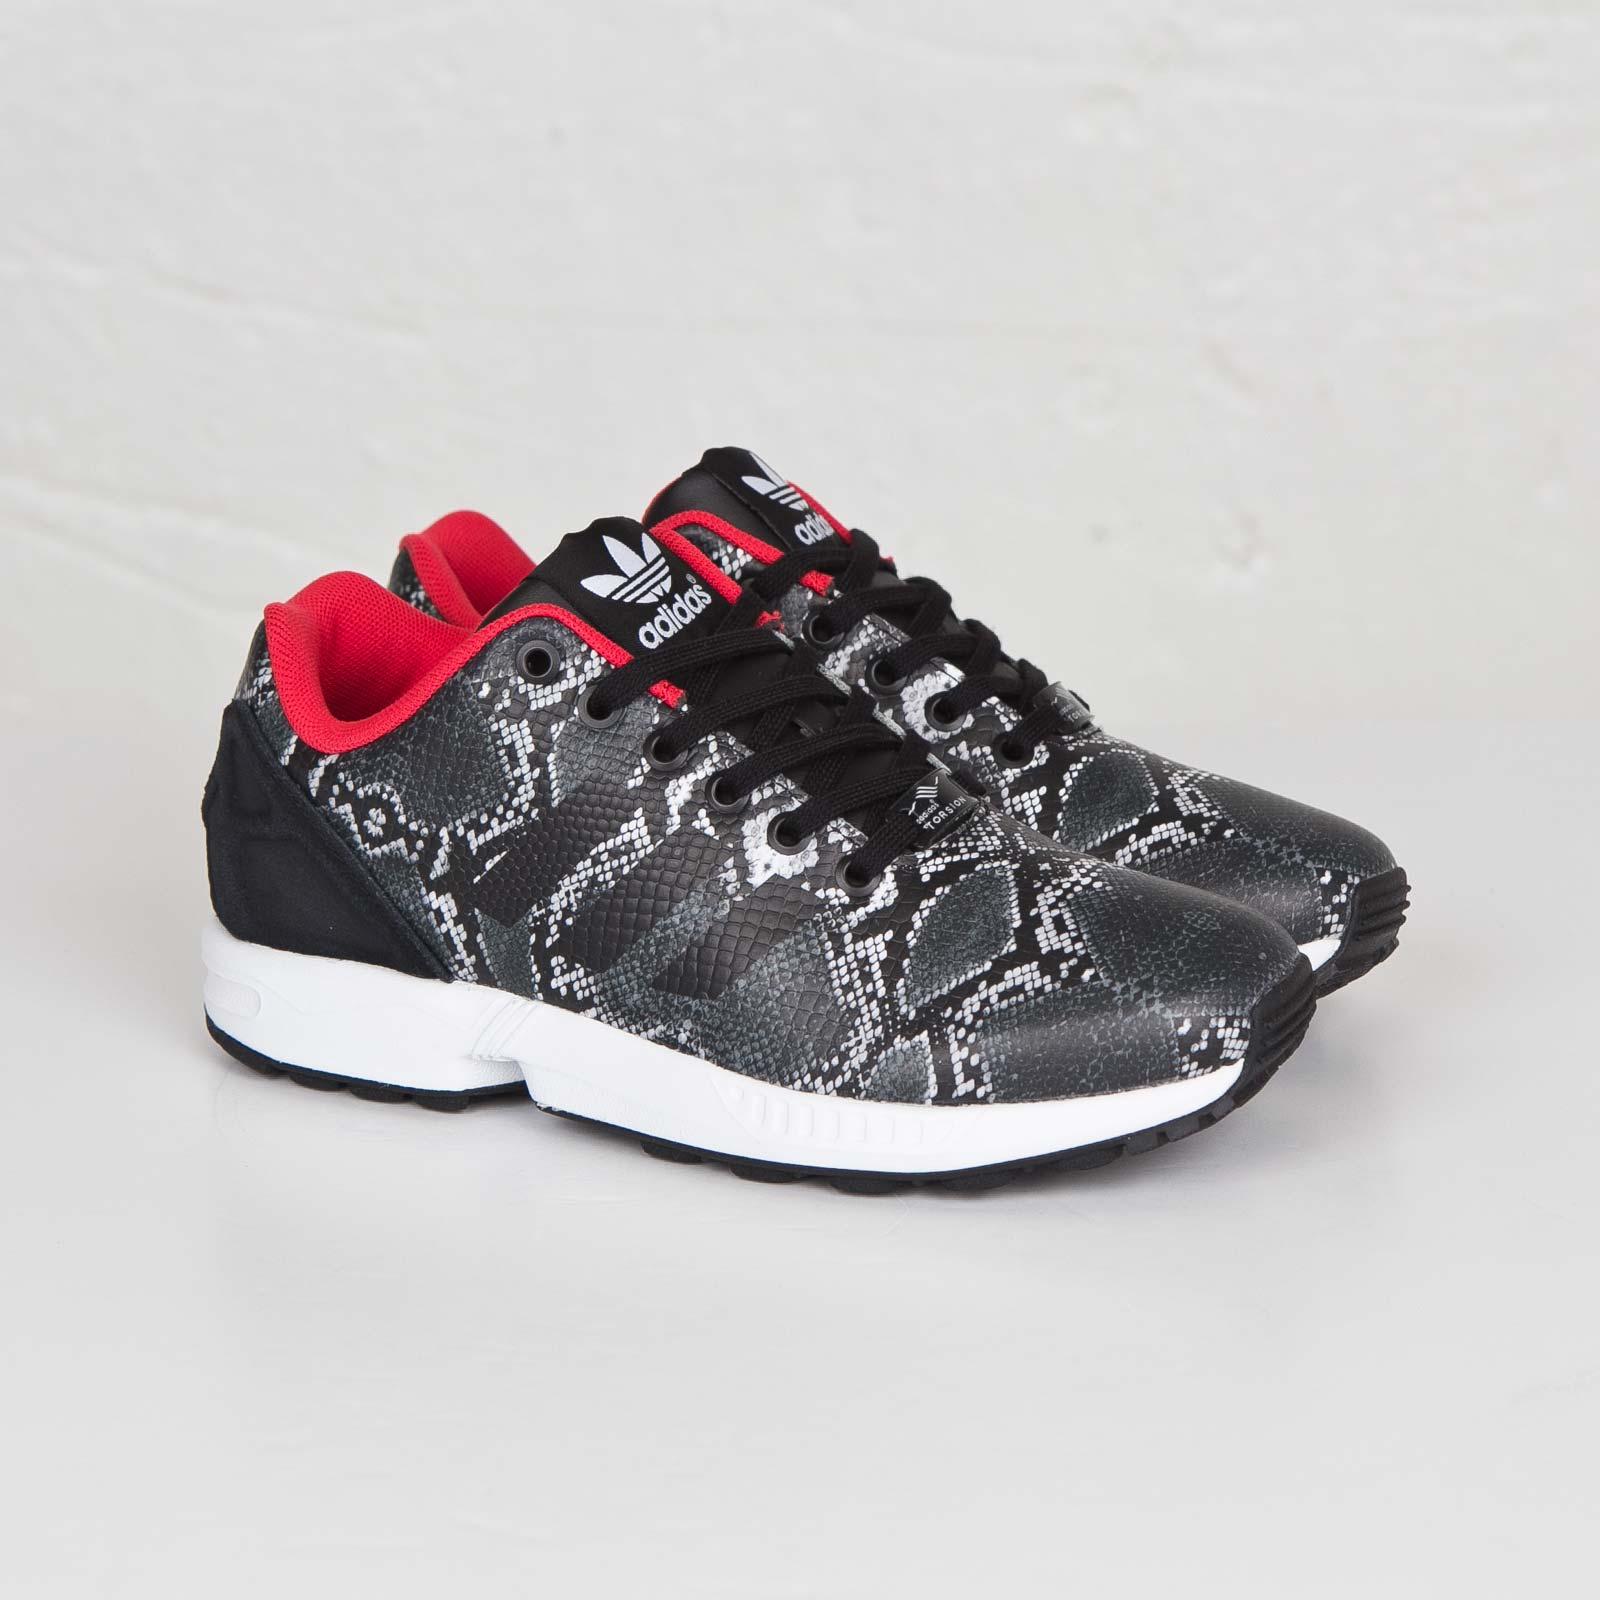 separation shoes 65a01 6aeb6 adidas ZX Flux W